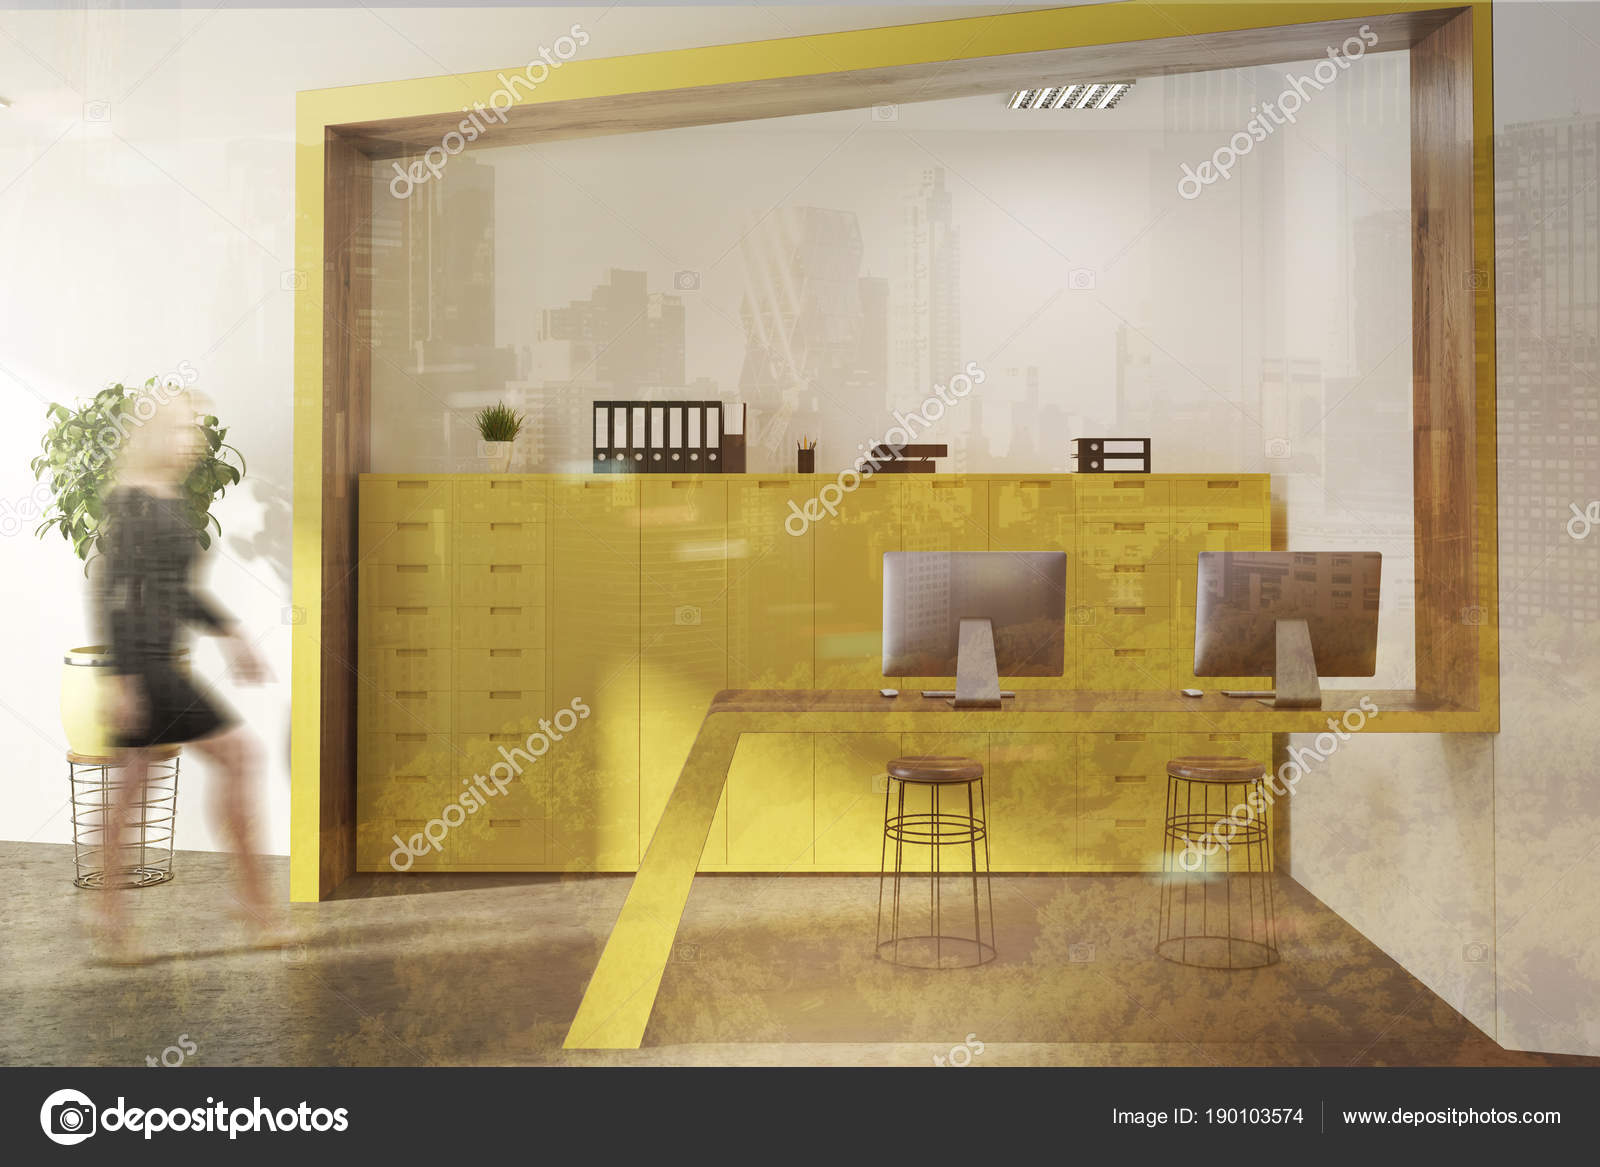 Accueil salle dattente de bureau jaune femme u2014 photographie